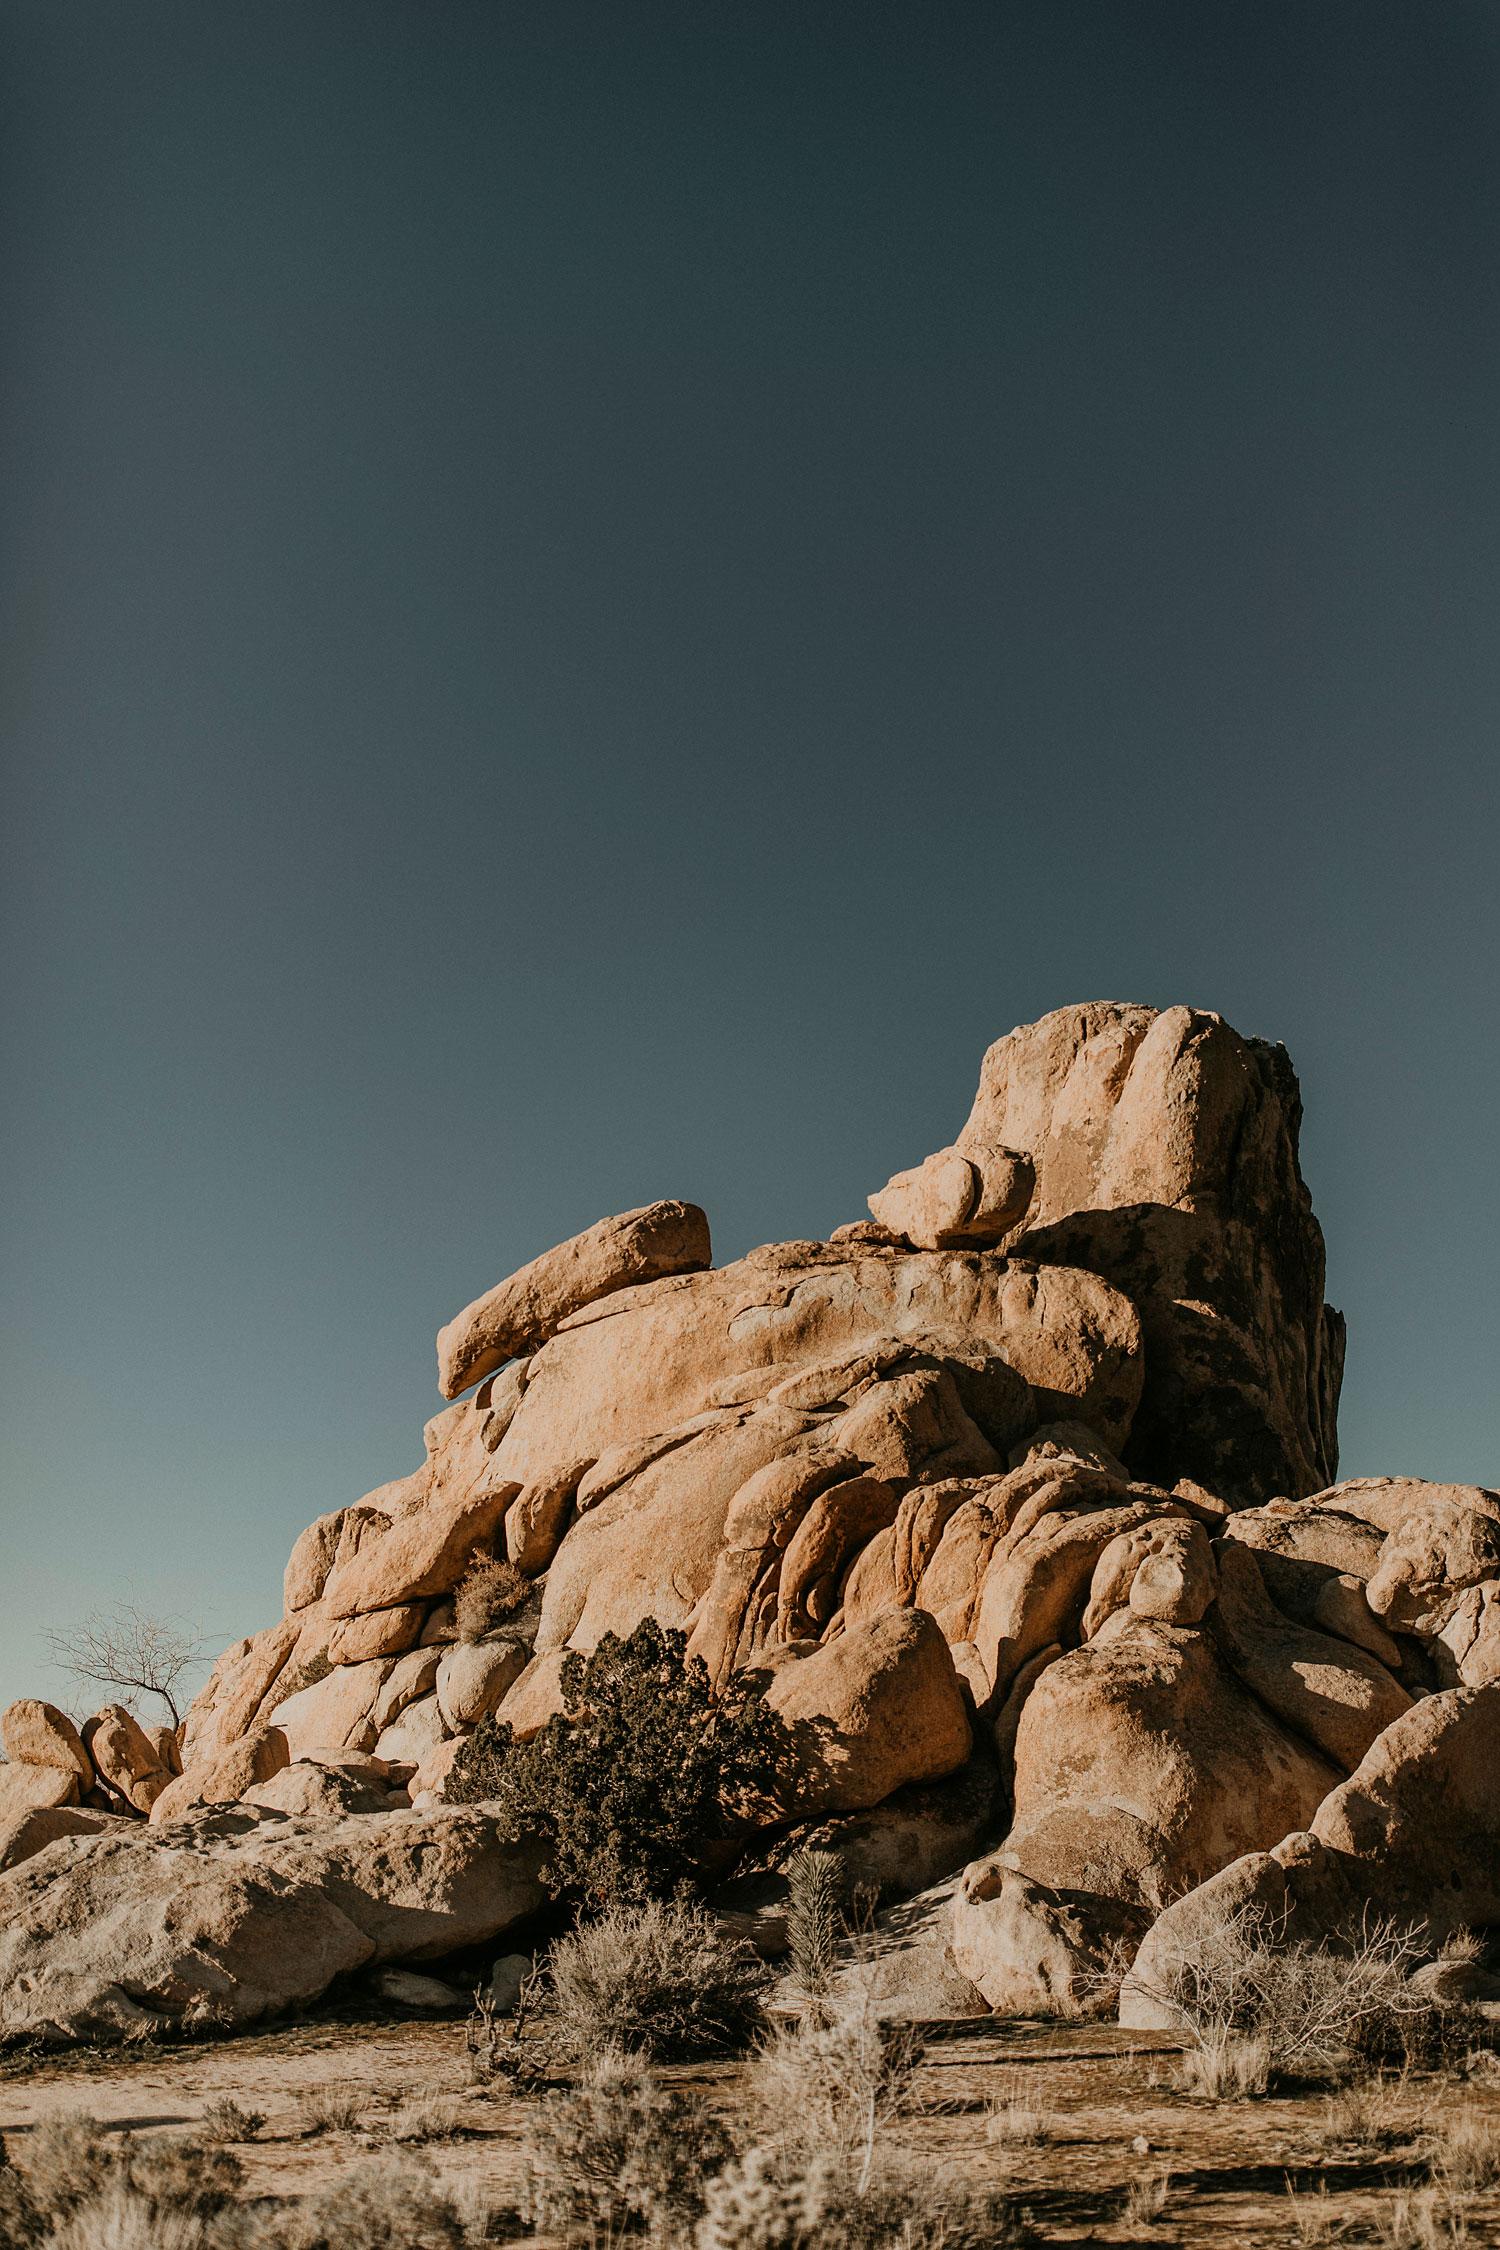 Joshua-Tree-Travel-Photographer-Self-Portraits-02.jpg